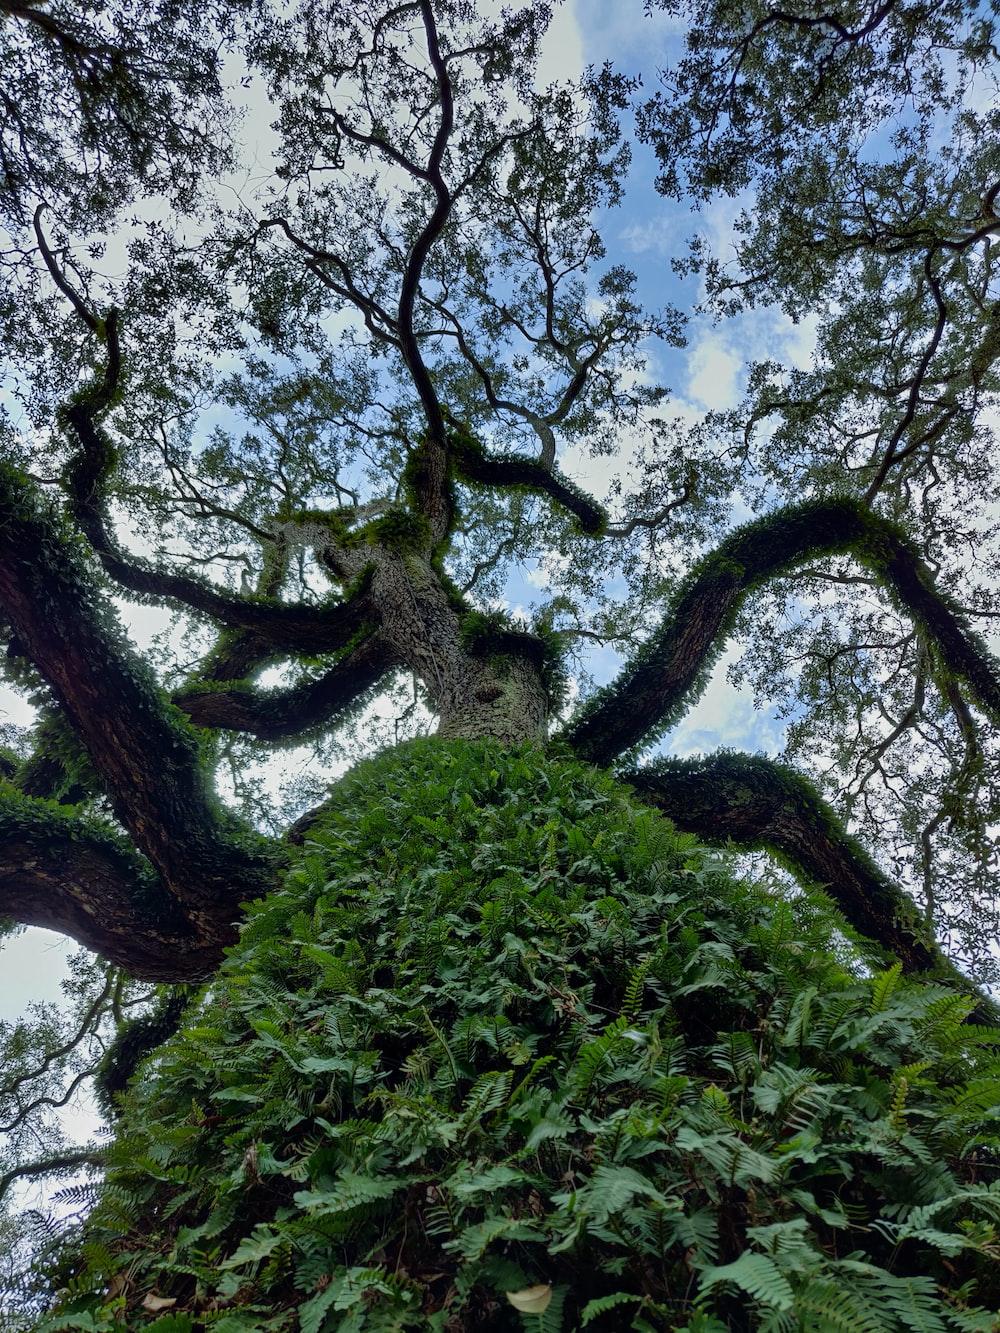 brown tree bark with moist